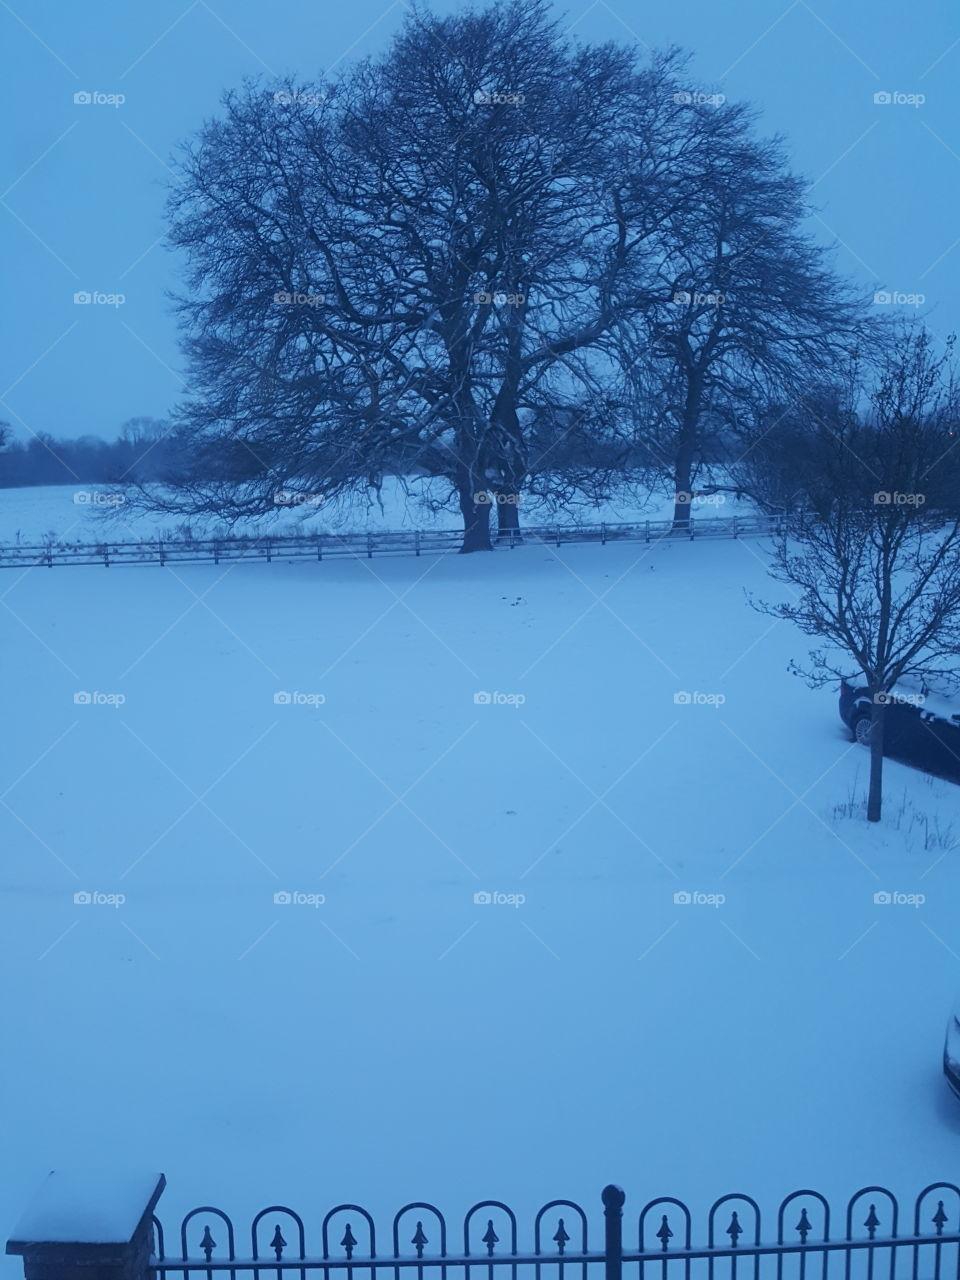 Winter, Tree, Landscape, Cold, Snow